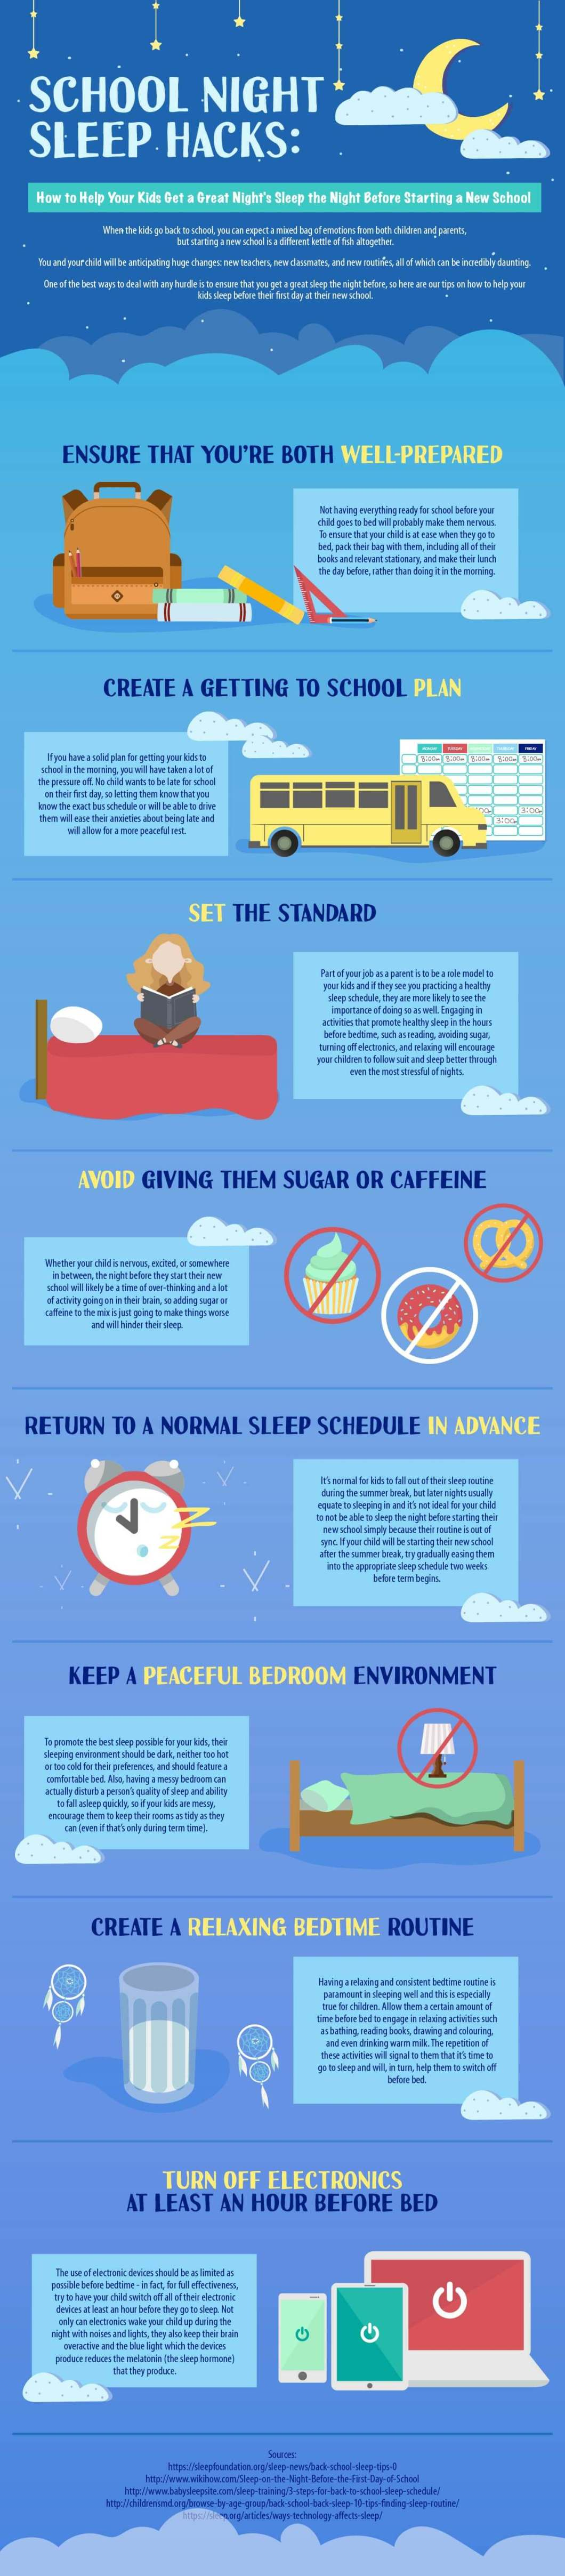 Sleep Hacks for the Night Before School Begins - Infographic